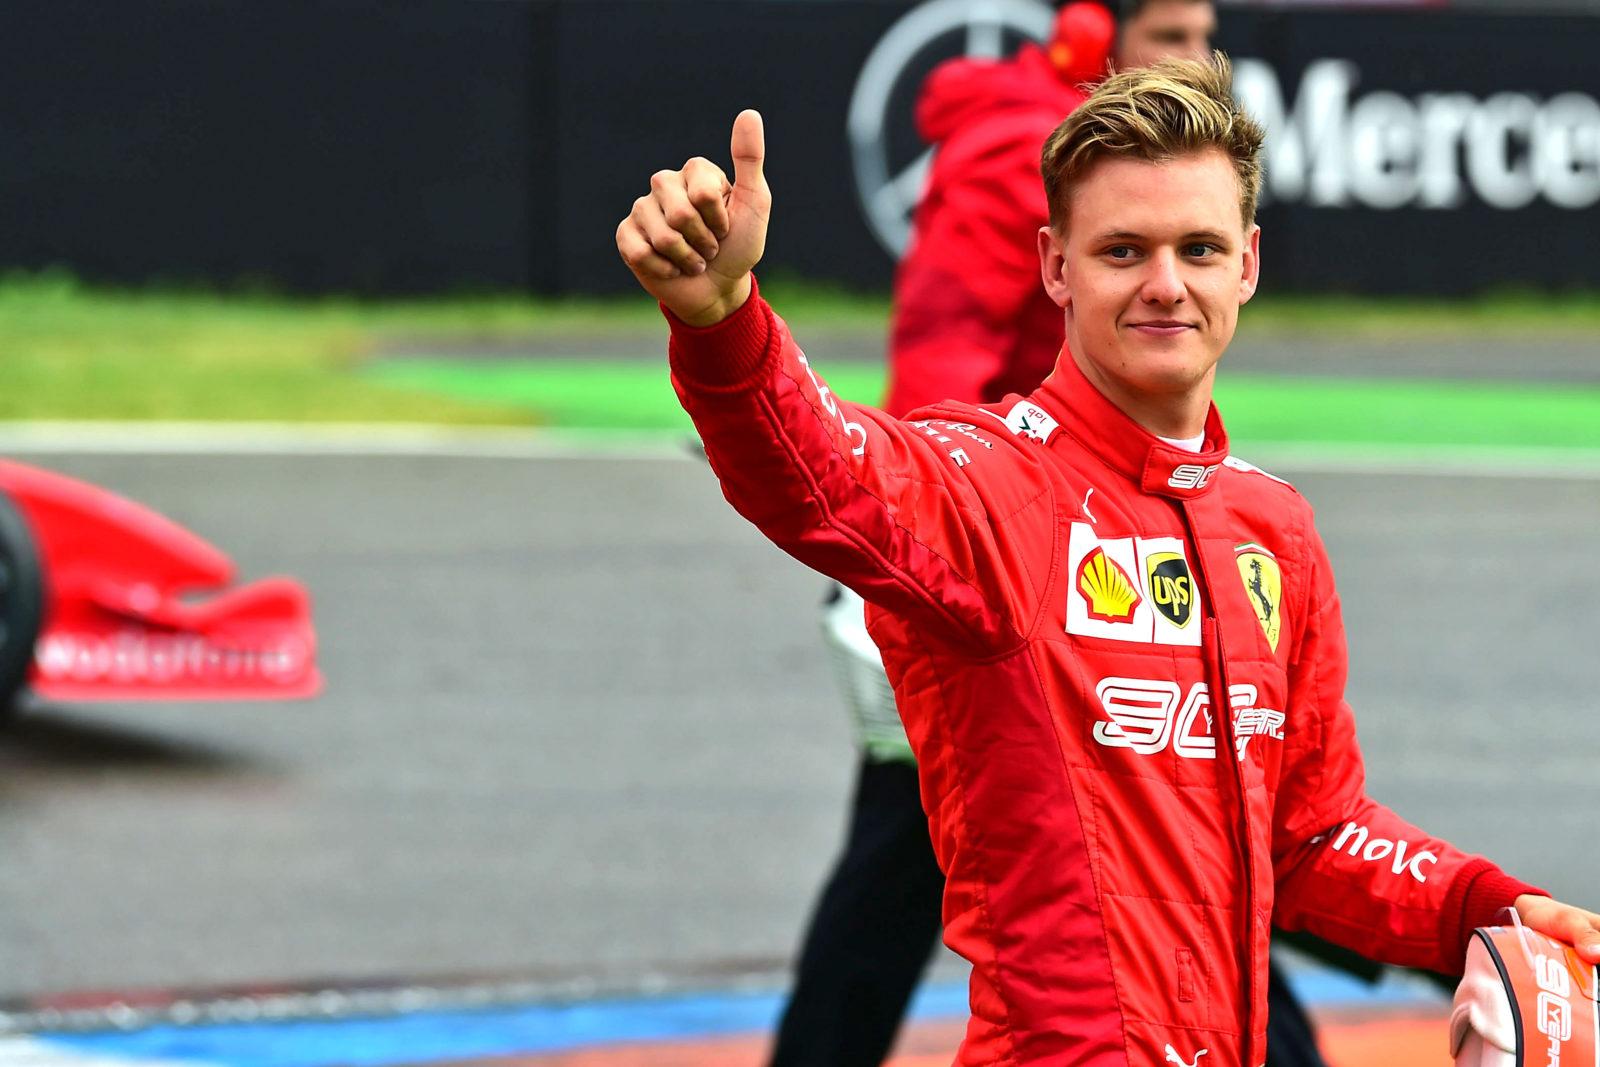 Filho de Michael Schumacher ascende à Fórmula 1 em 2021